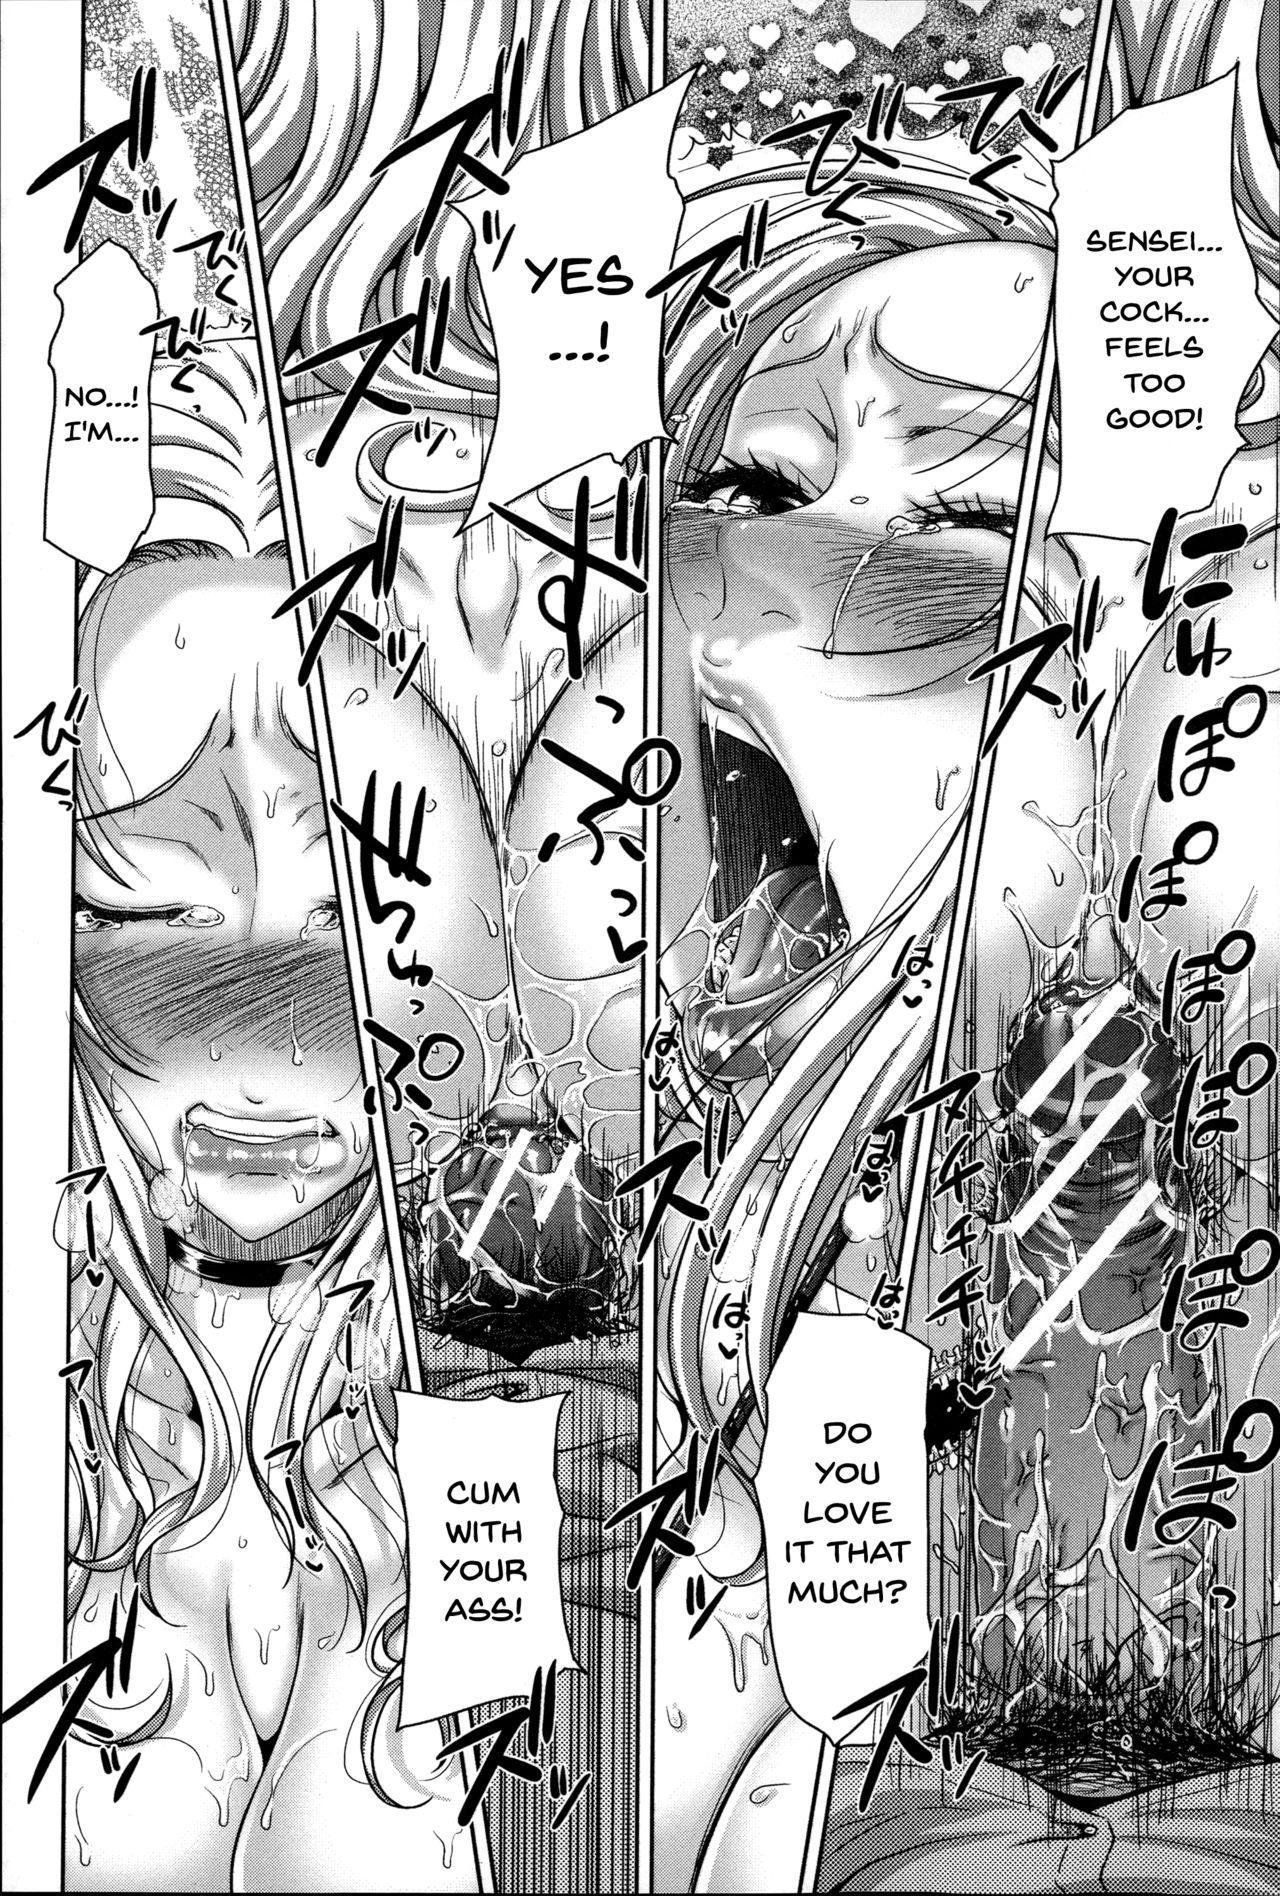 Pakotate! Seikouritsu 0% no Teppeki Bishojo VS Seikouritsu 100% no Hentai Katei Kyoushi   Pakotate! Sex Rate 0% Iron-Willed Beautiful Virgins VS Sex Rate 100% Perverted Coach 33